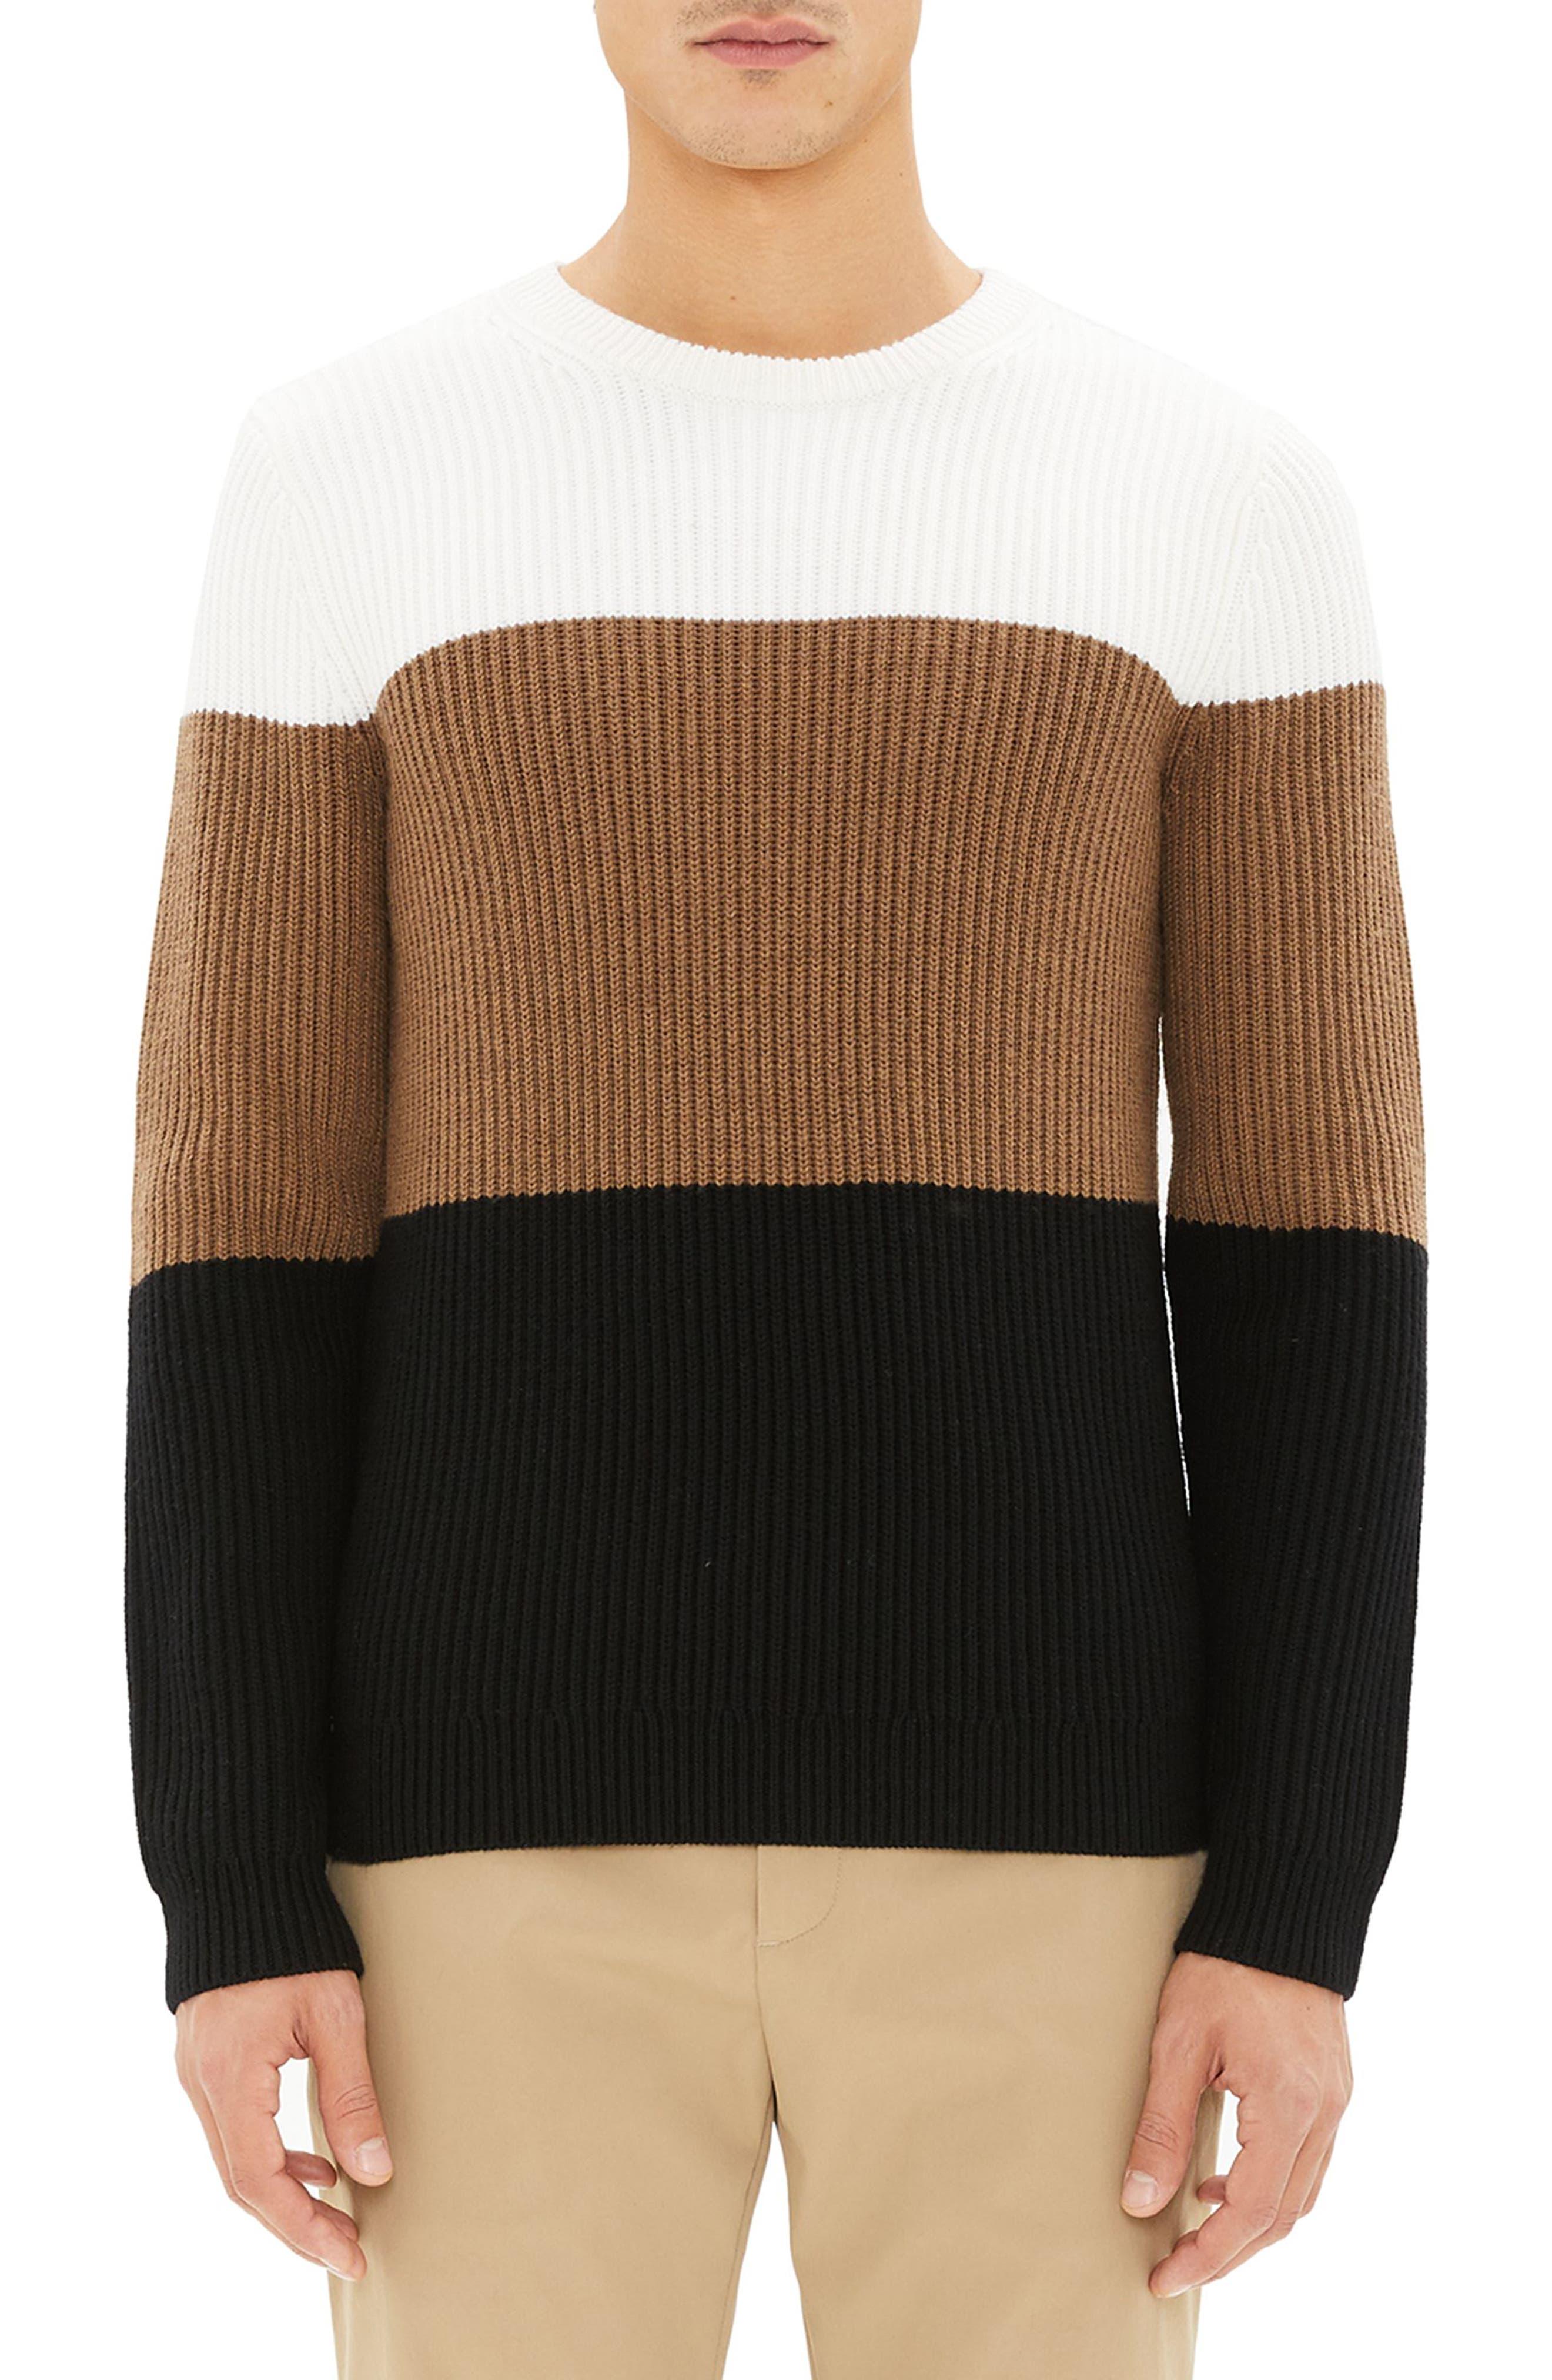 Romman Colorblock Merino Wool Sweater,                         Main,                         color, 110